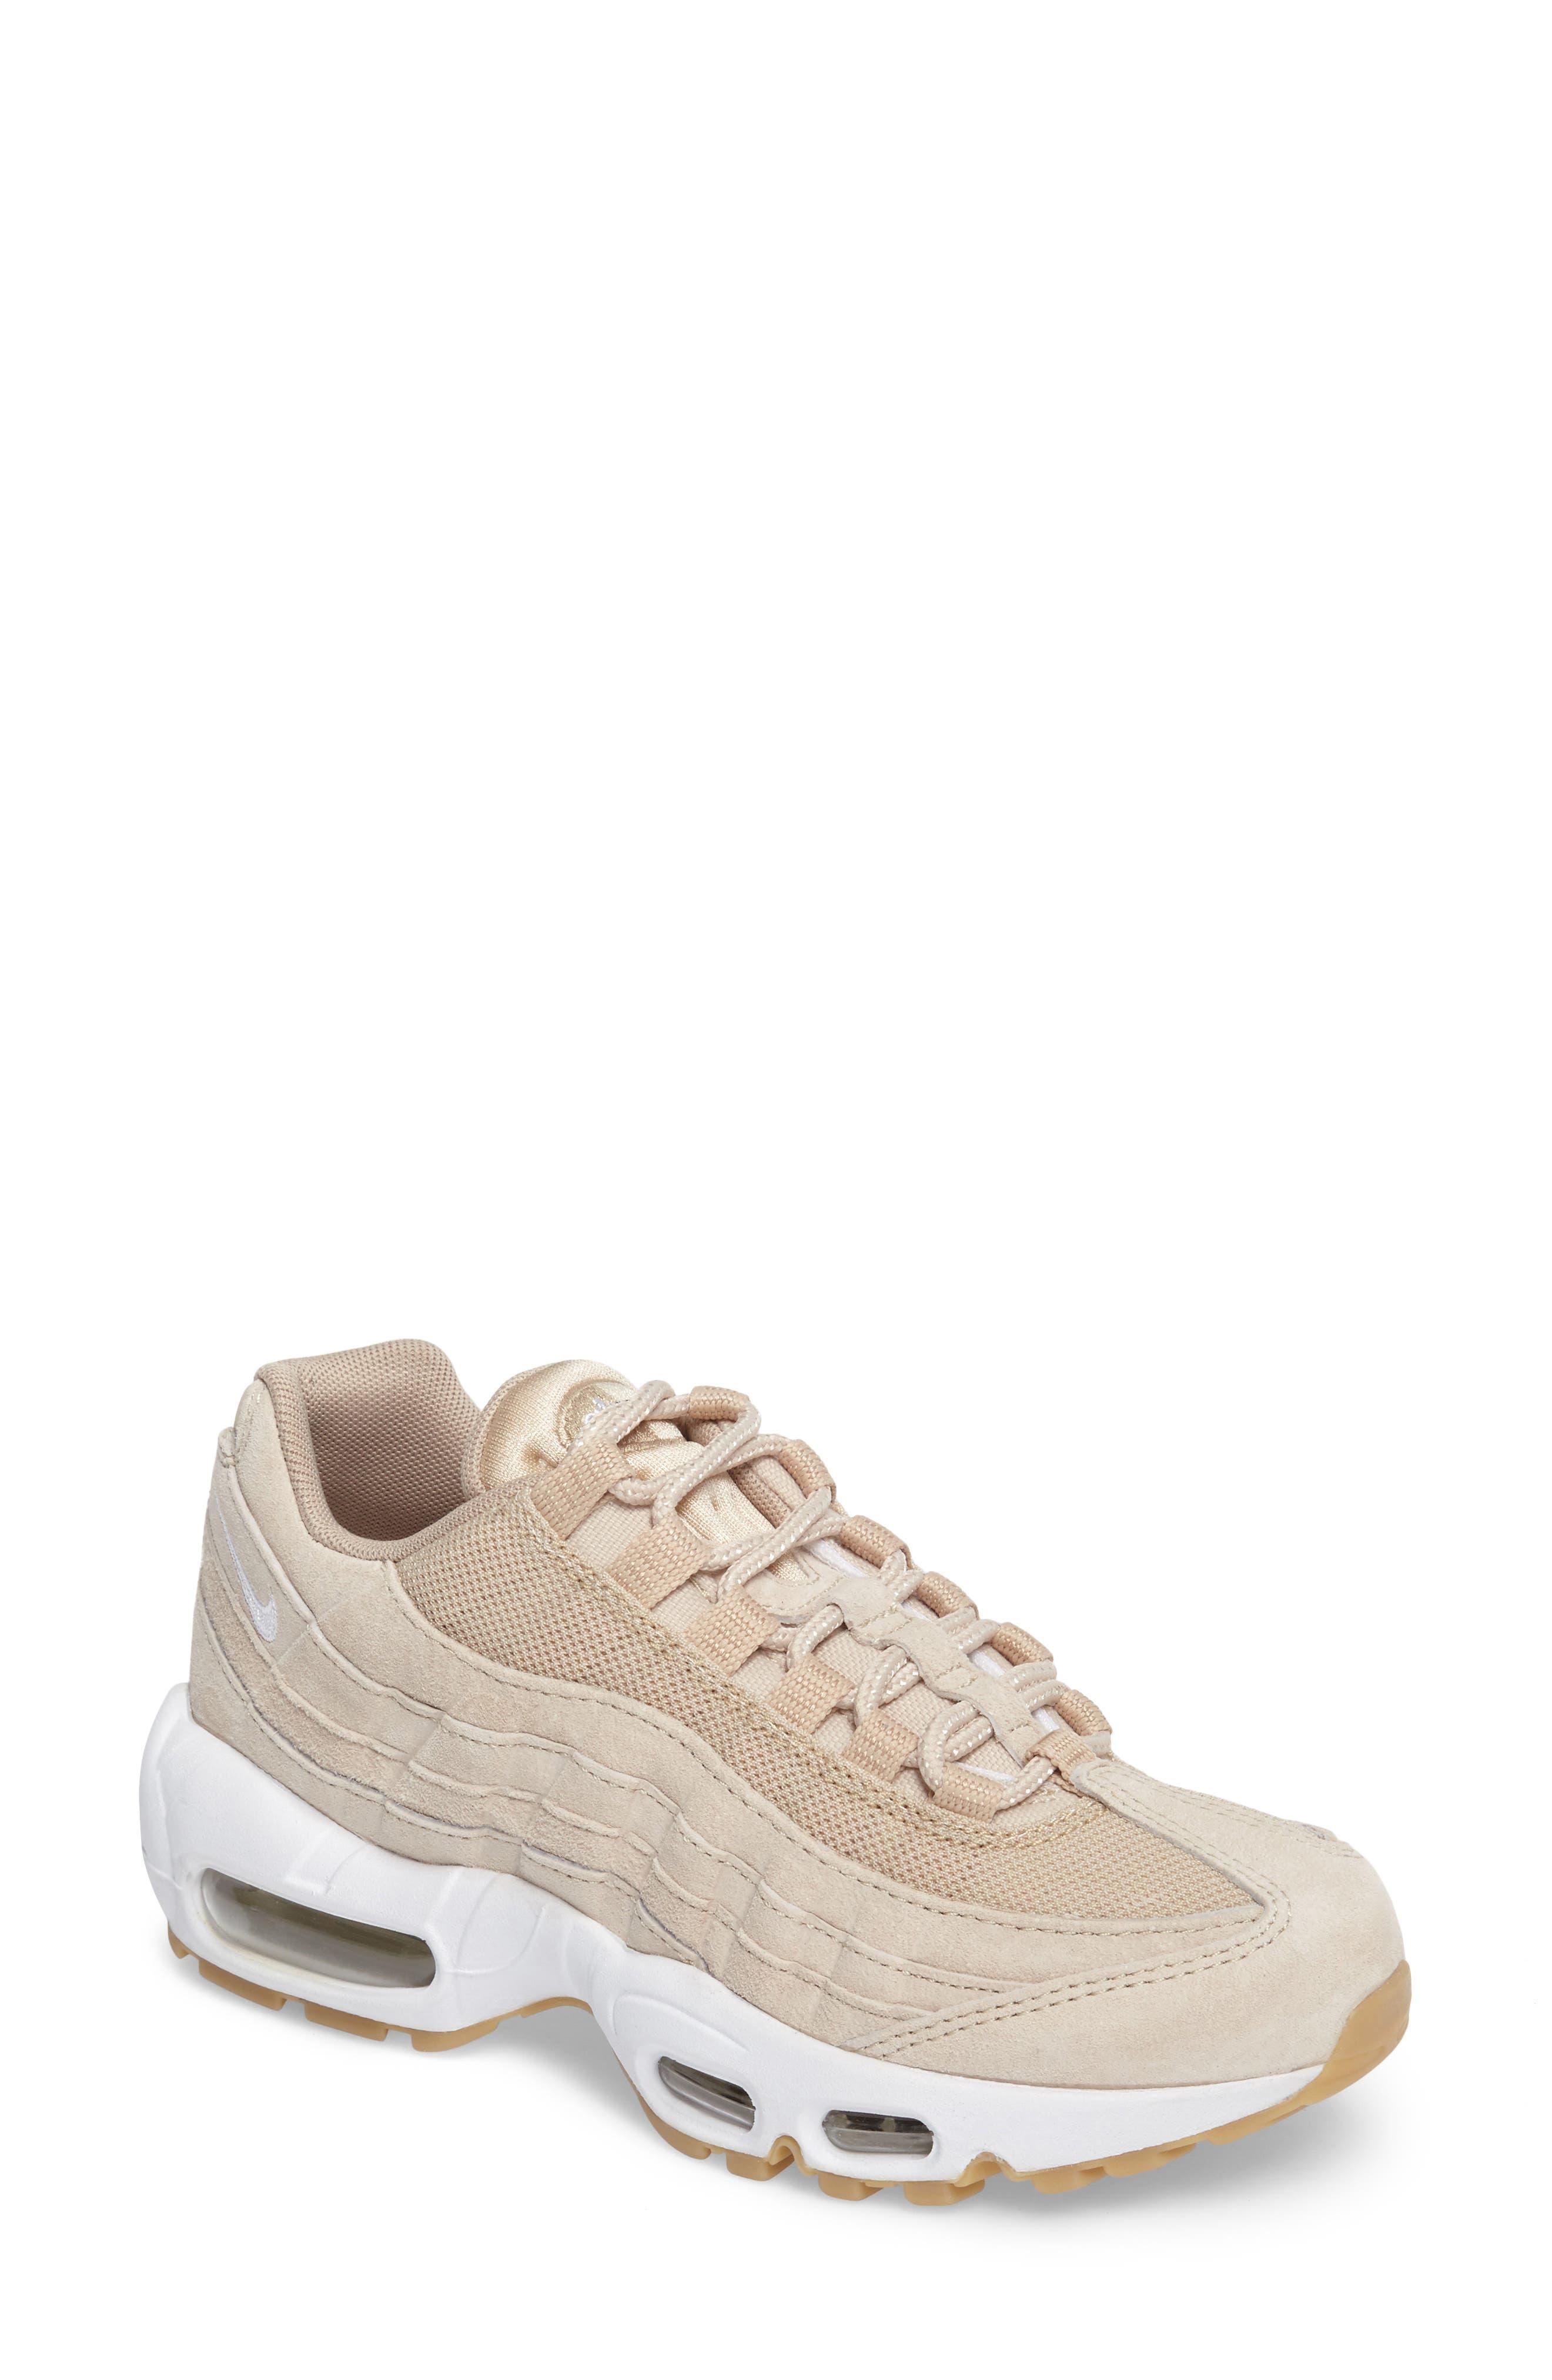 Air Max 95 SD Sneaker,                         Main,                         color, 250